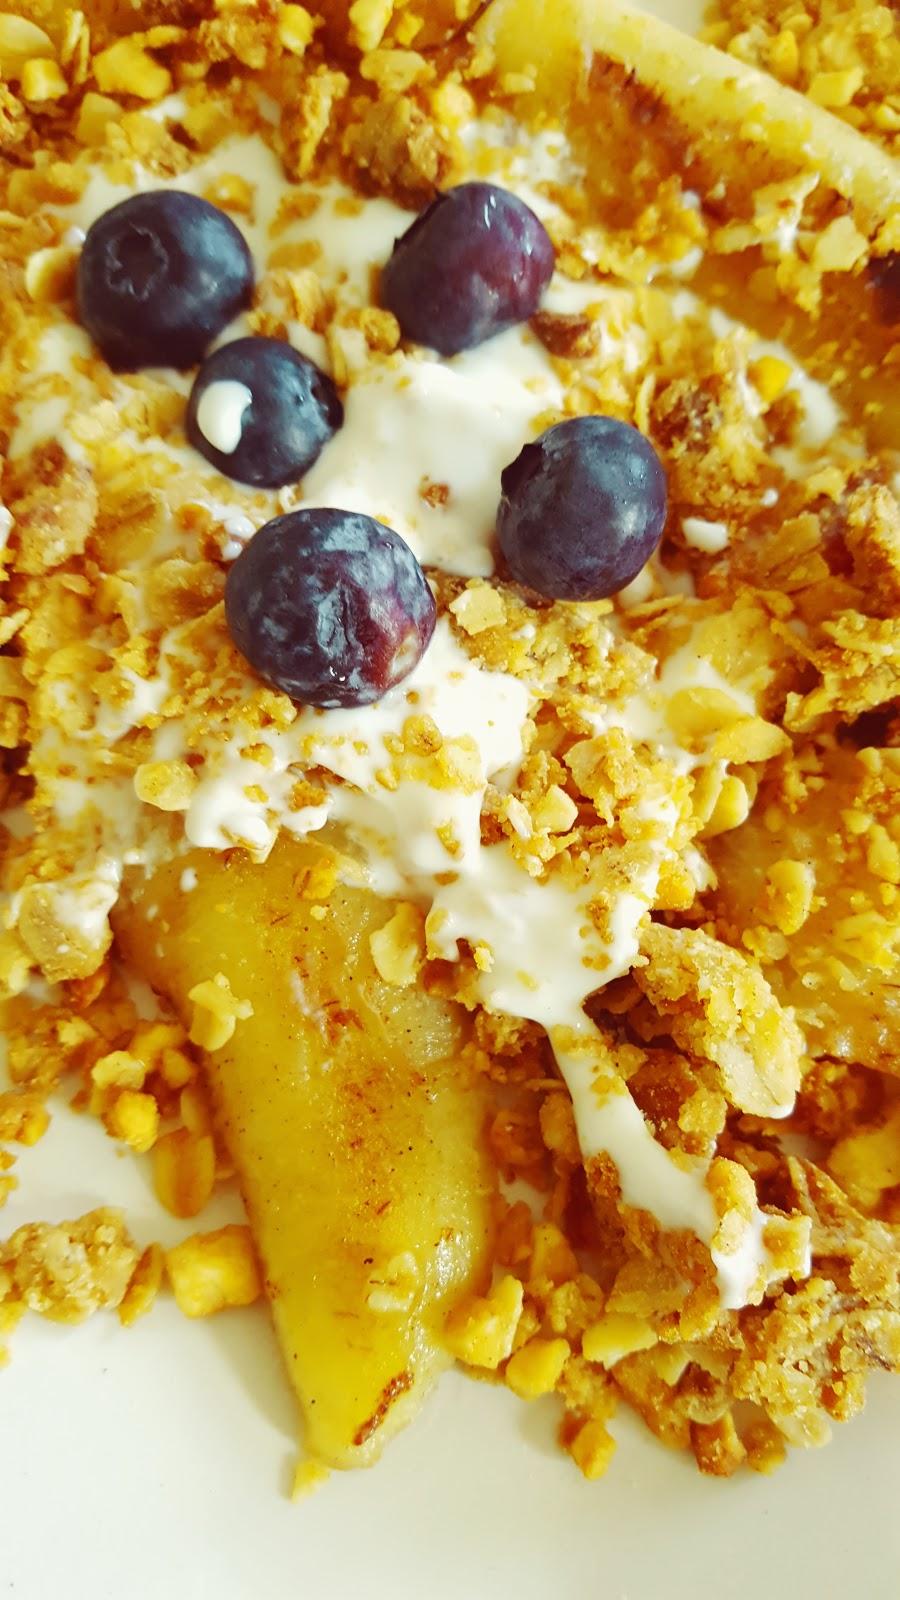 Cherry and Nut Granola Treat: #SwearbyIt Challenge